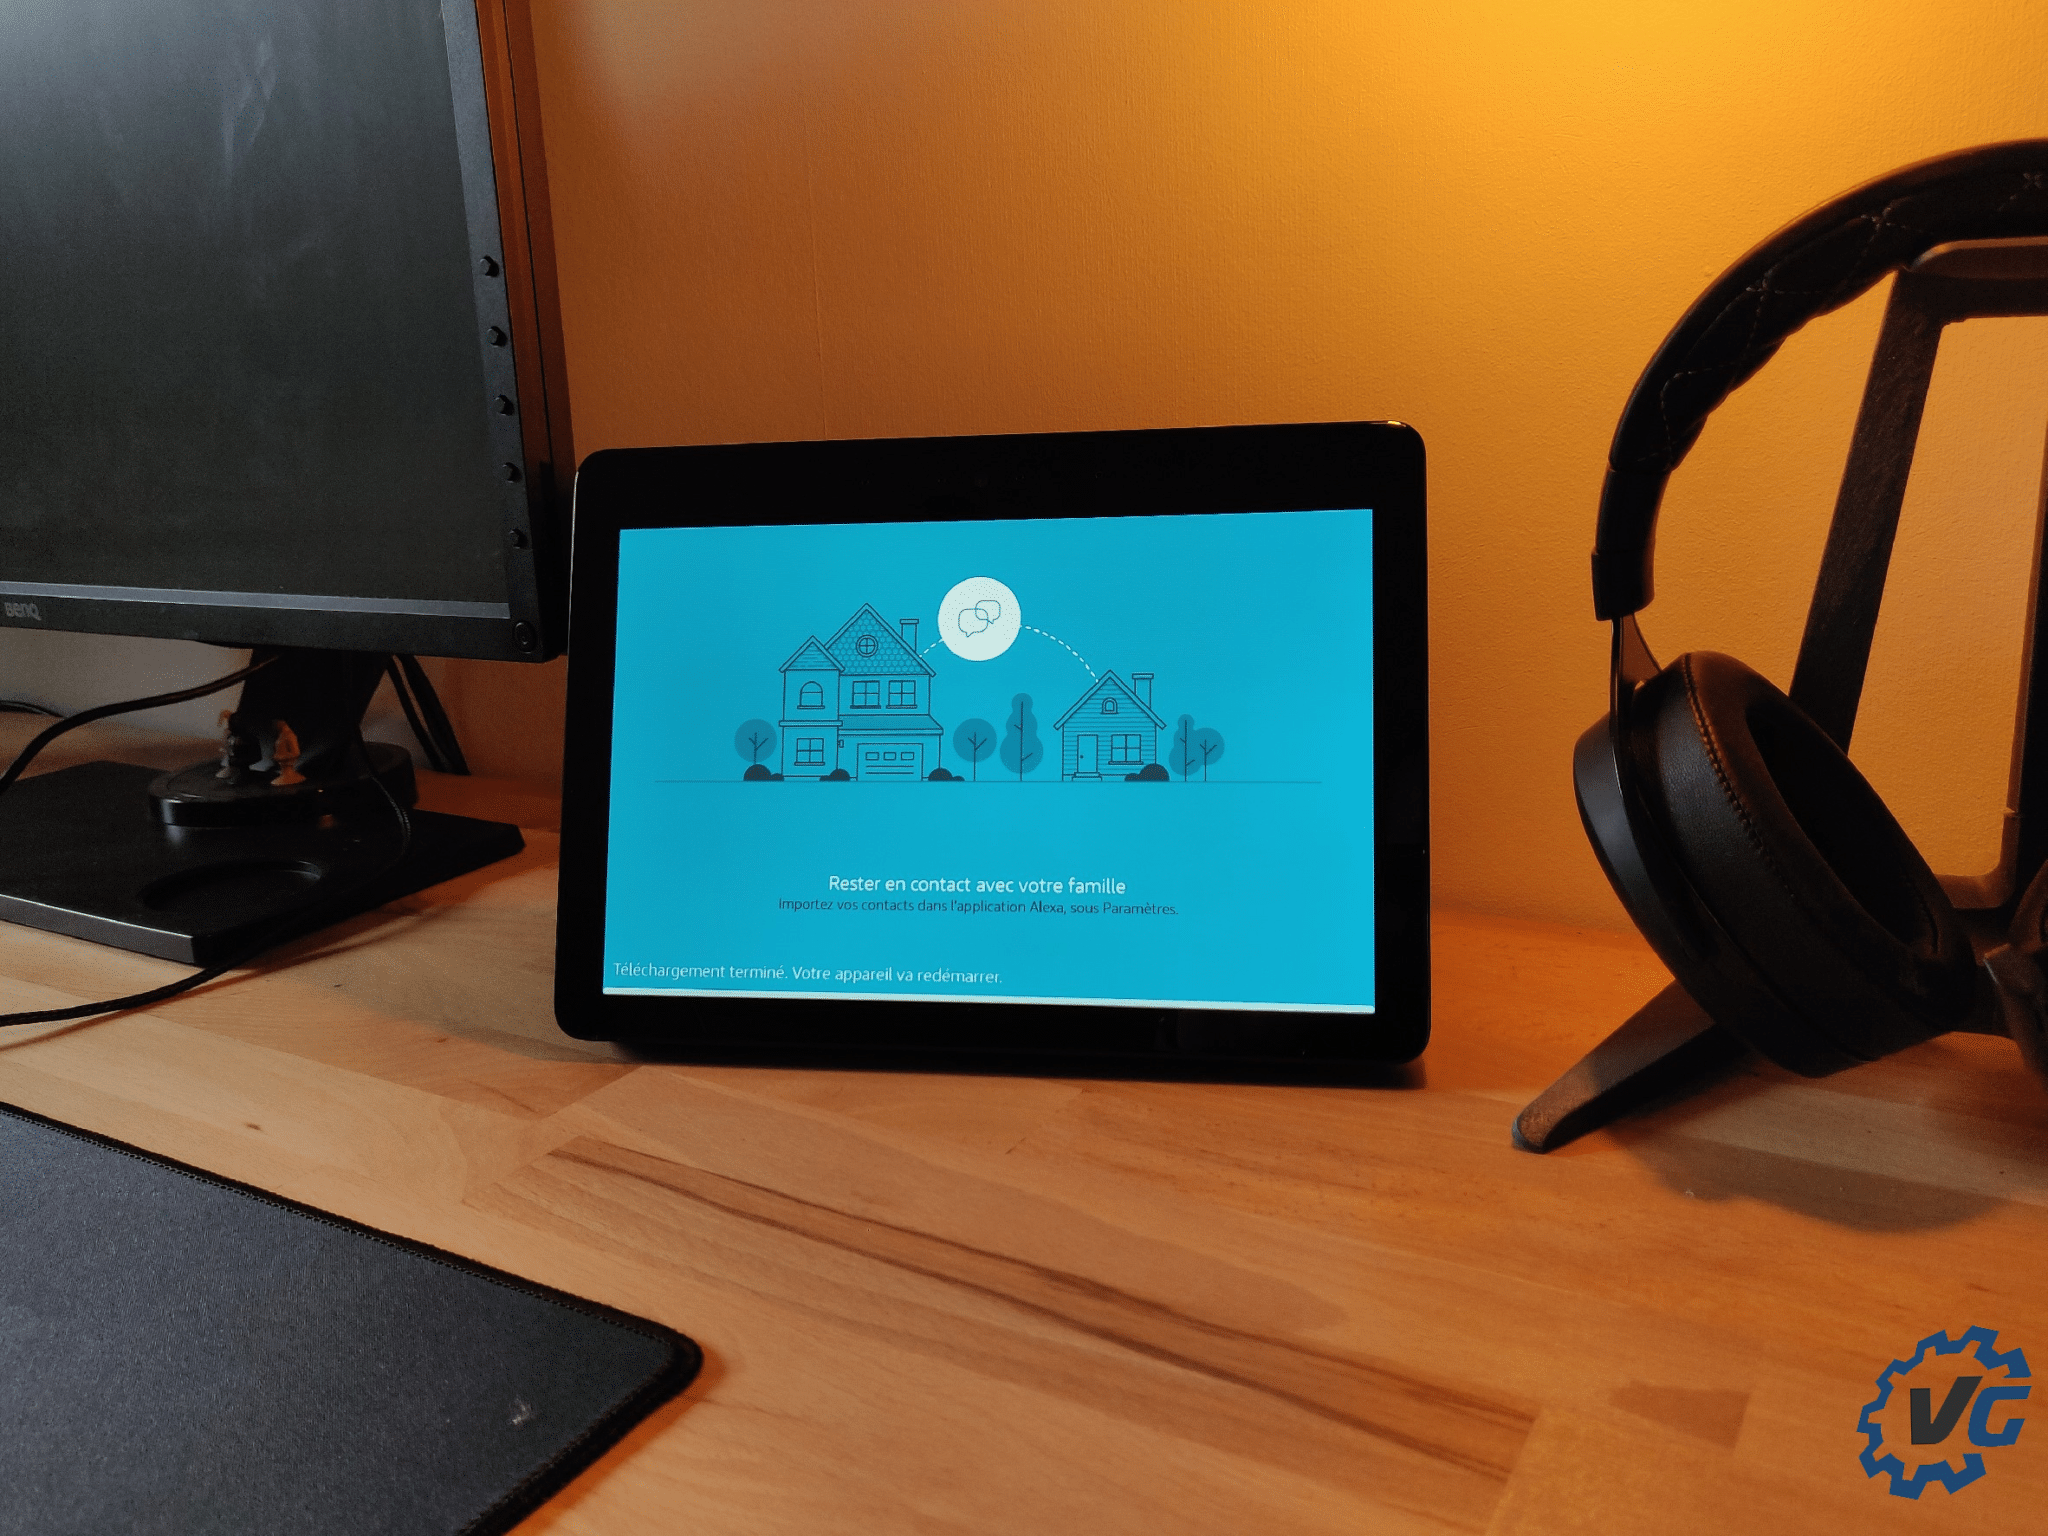 Echo Show Amazon